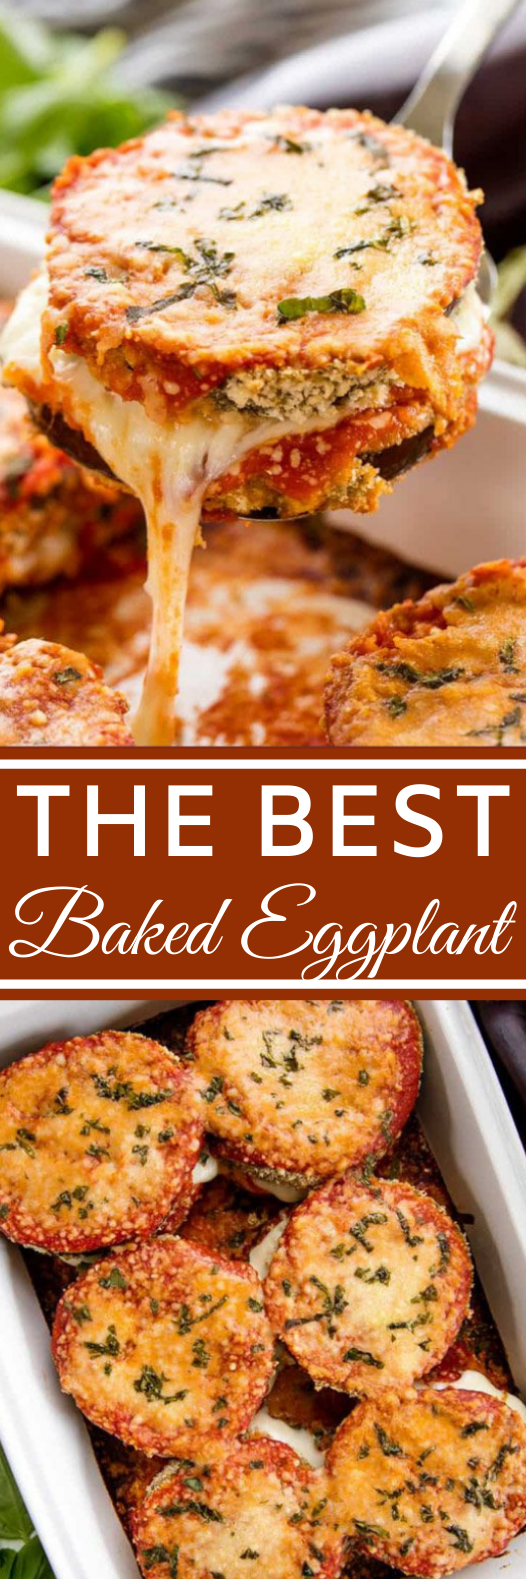 Best Baked Eggplant Parmesan #dinner #recipes #baked #vegetarian #easy